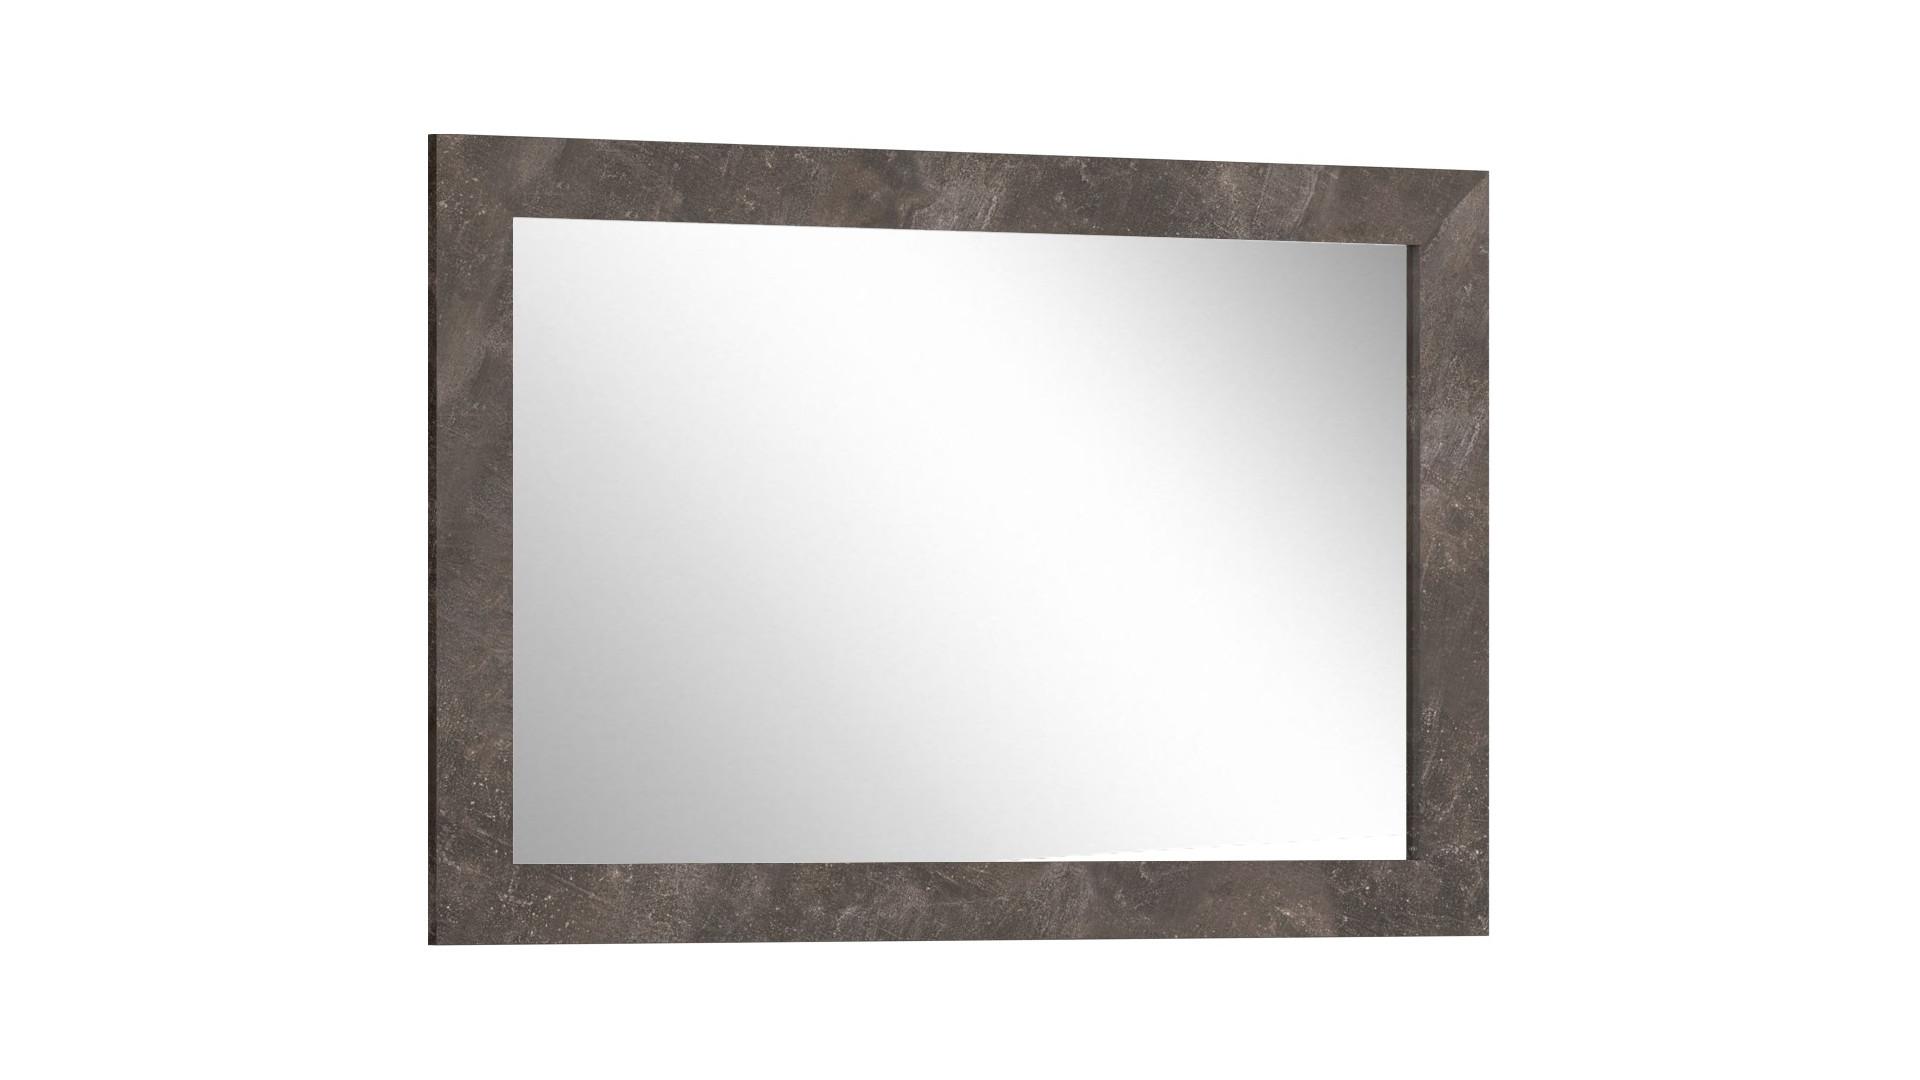 Зеркало к комоду Прага  Дуб Белый Крафт/Ателье Темное